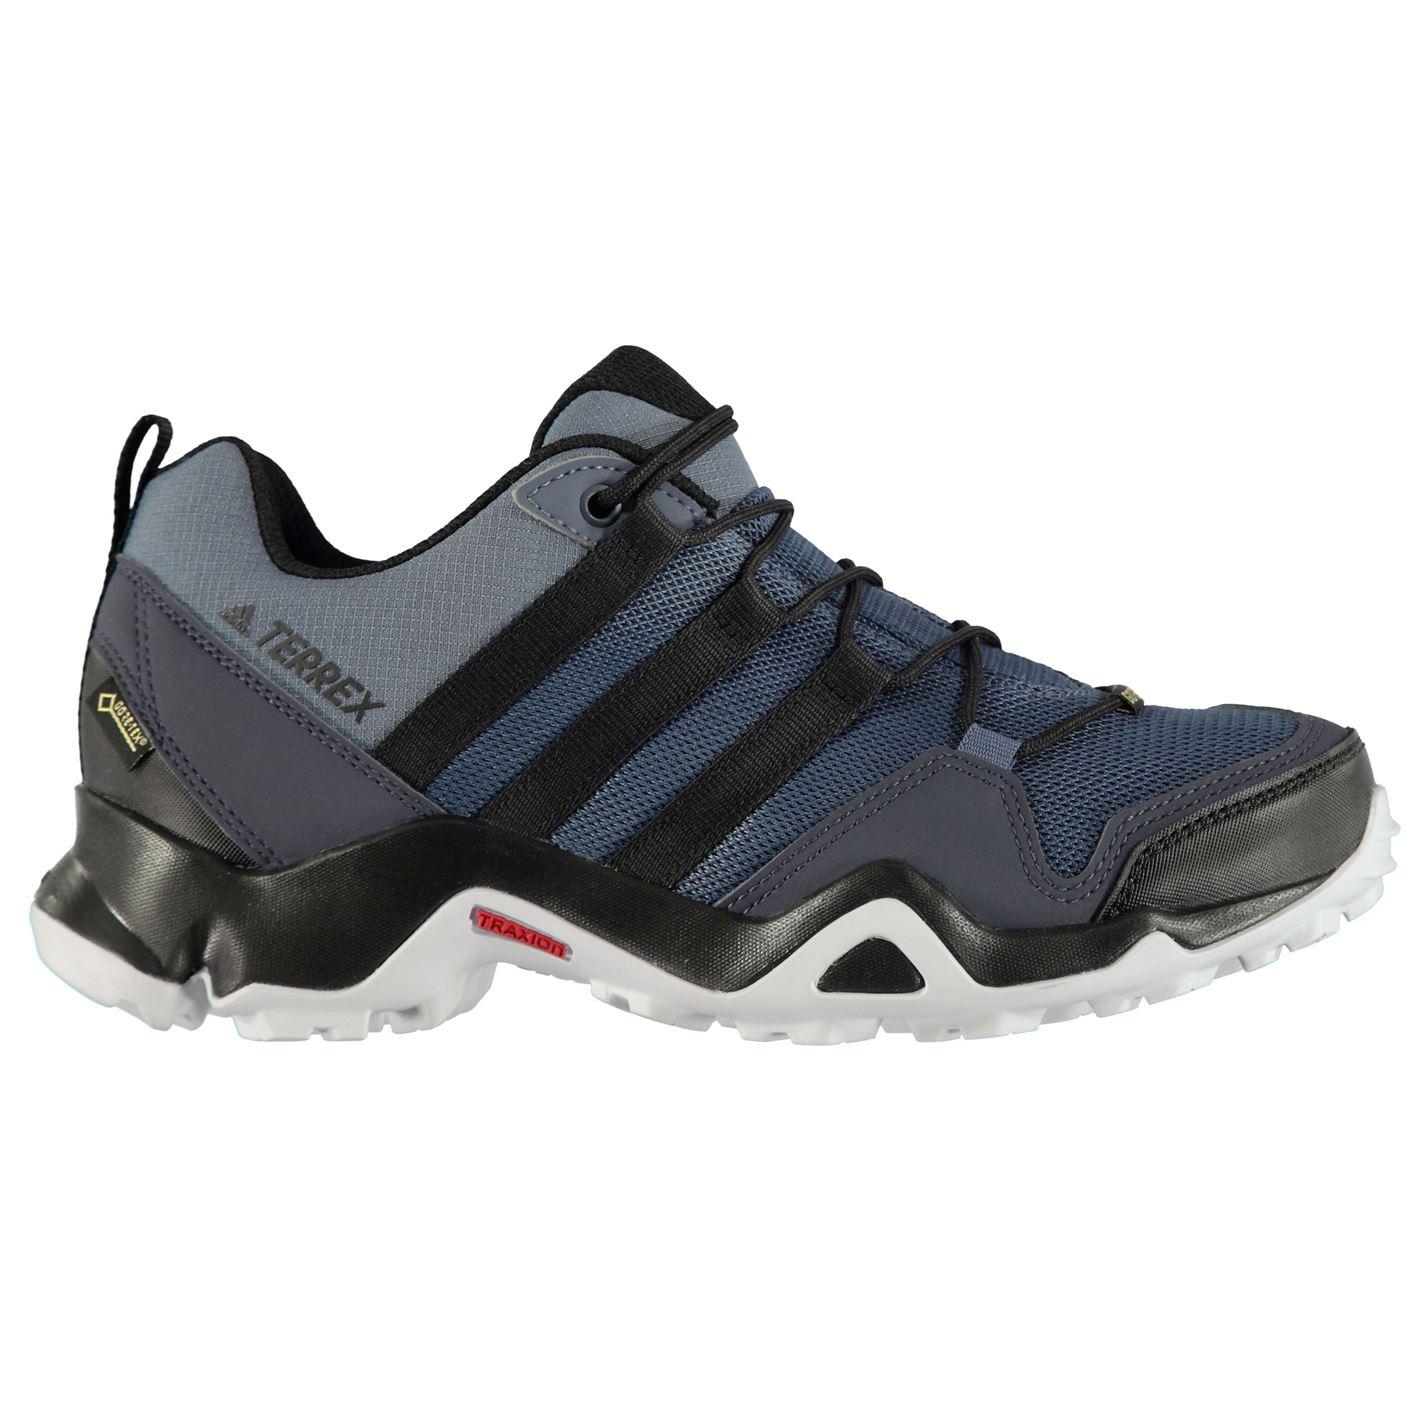 Adidas Terrex AX2R GTX Low Ladies Walking Shoes